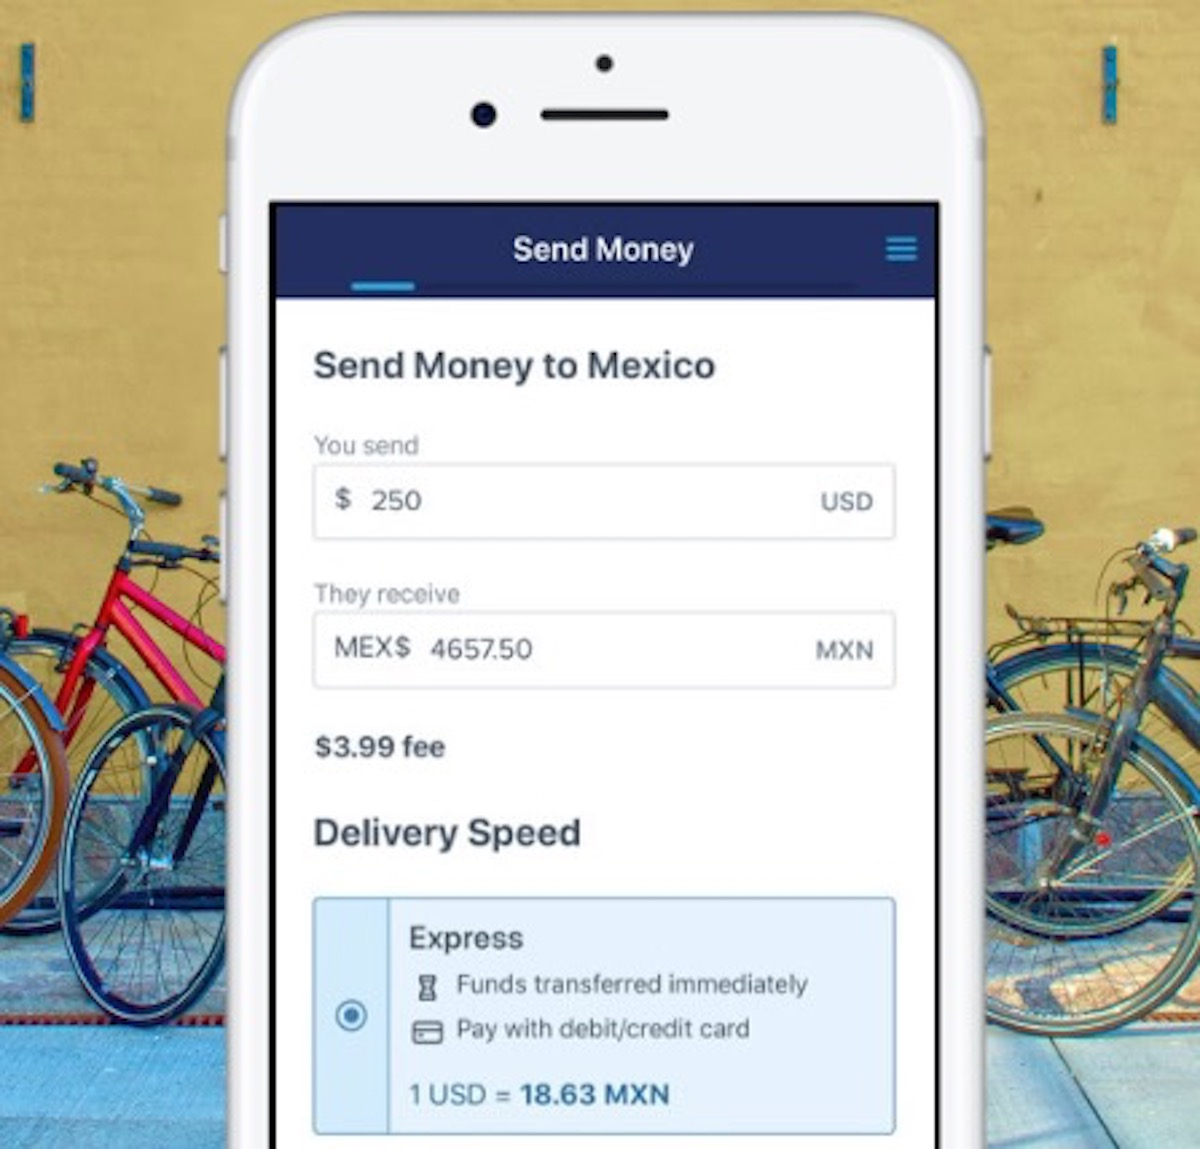 Remitly: International Money Transfer Service Remitly Raises $220